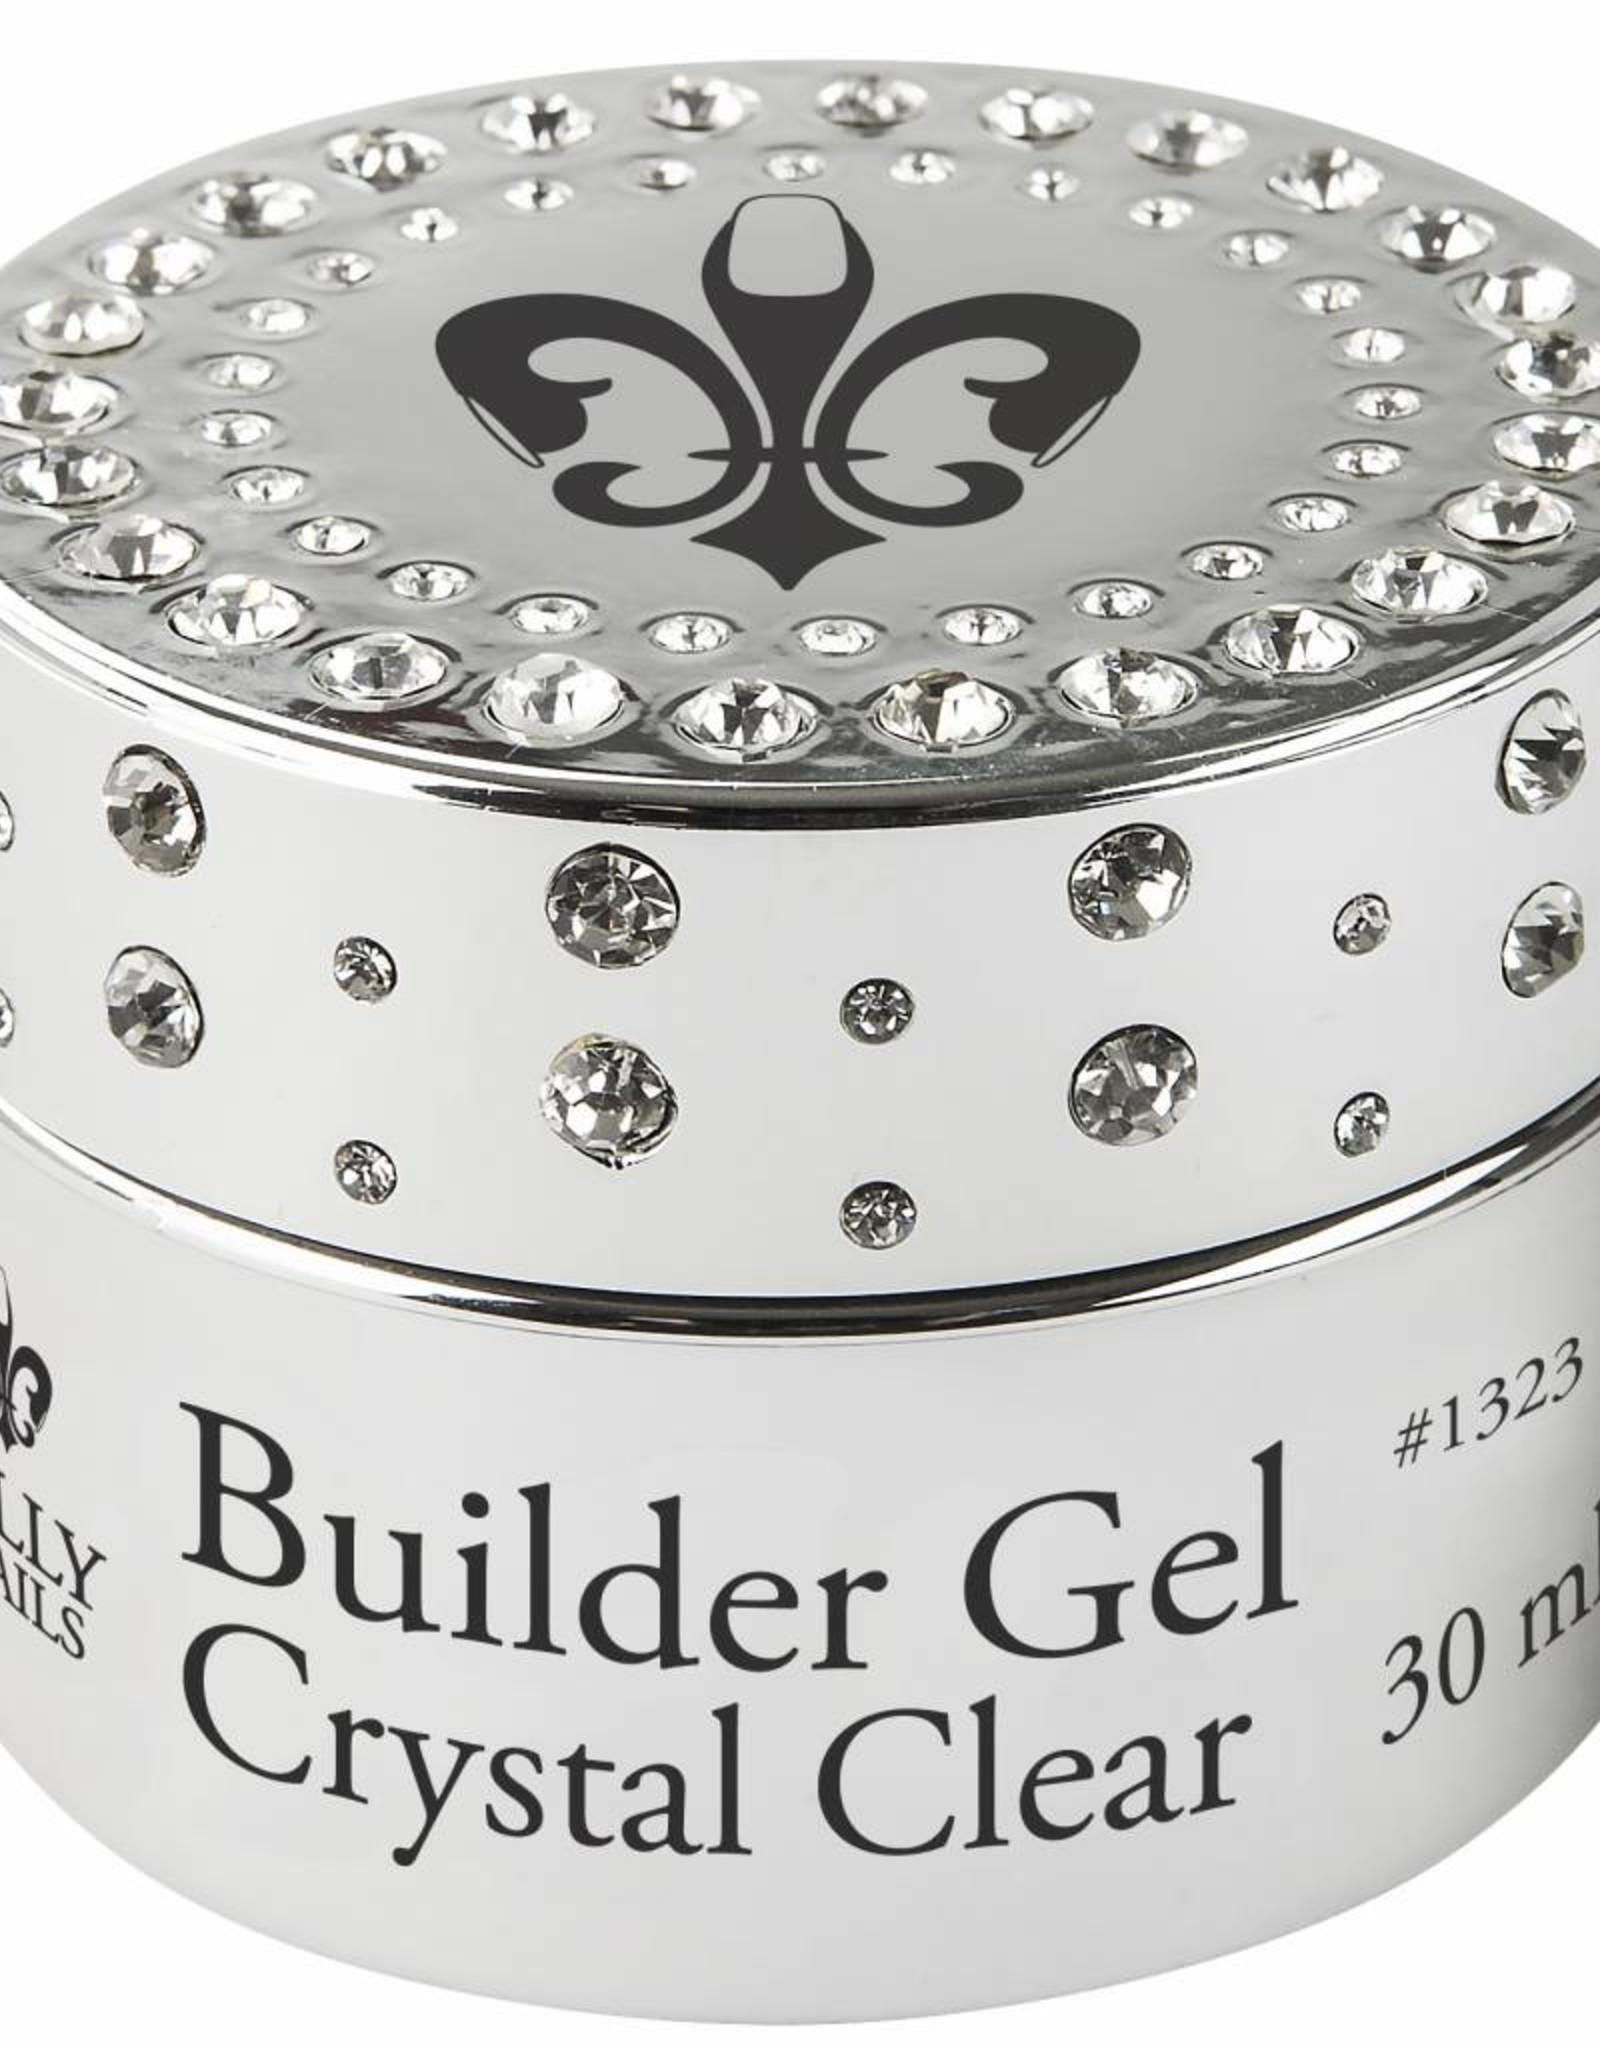 Builder Gel Crystal Clear